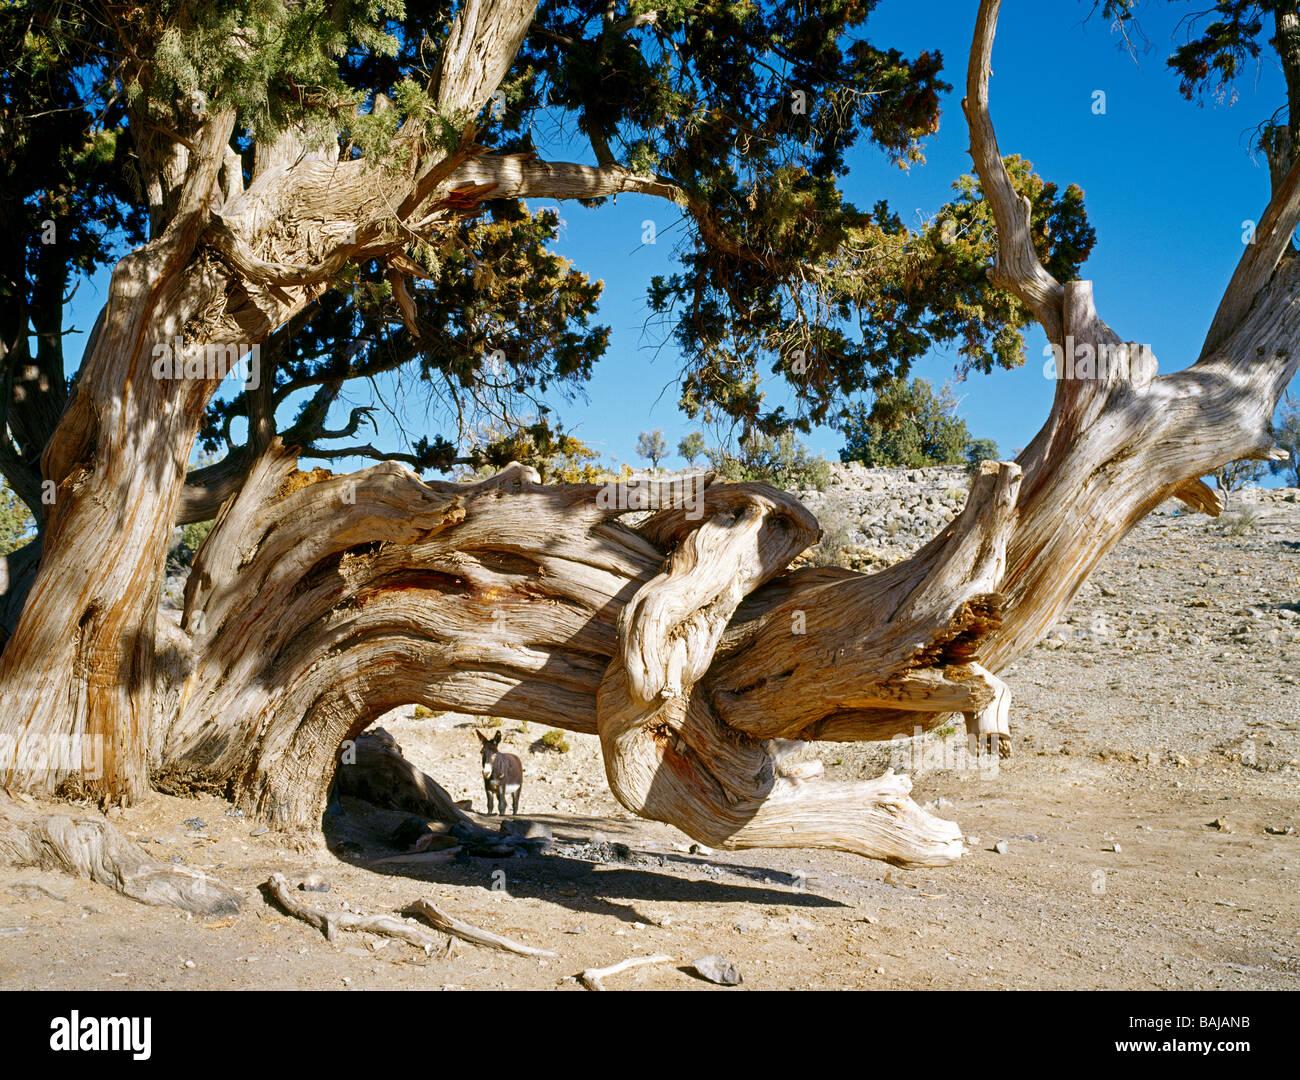 Donkey waiting behind a century old Juniper tree on the Sayq Plateau Oman Esel wartet hinter einem Jahrhunderte - Stock Image